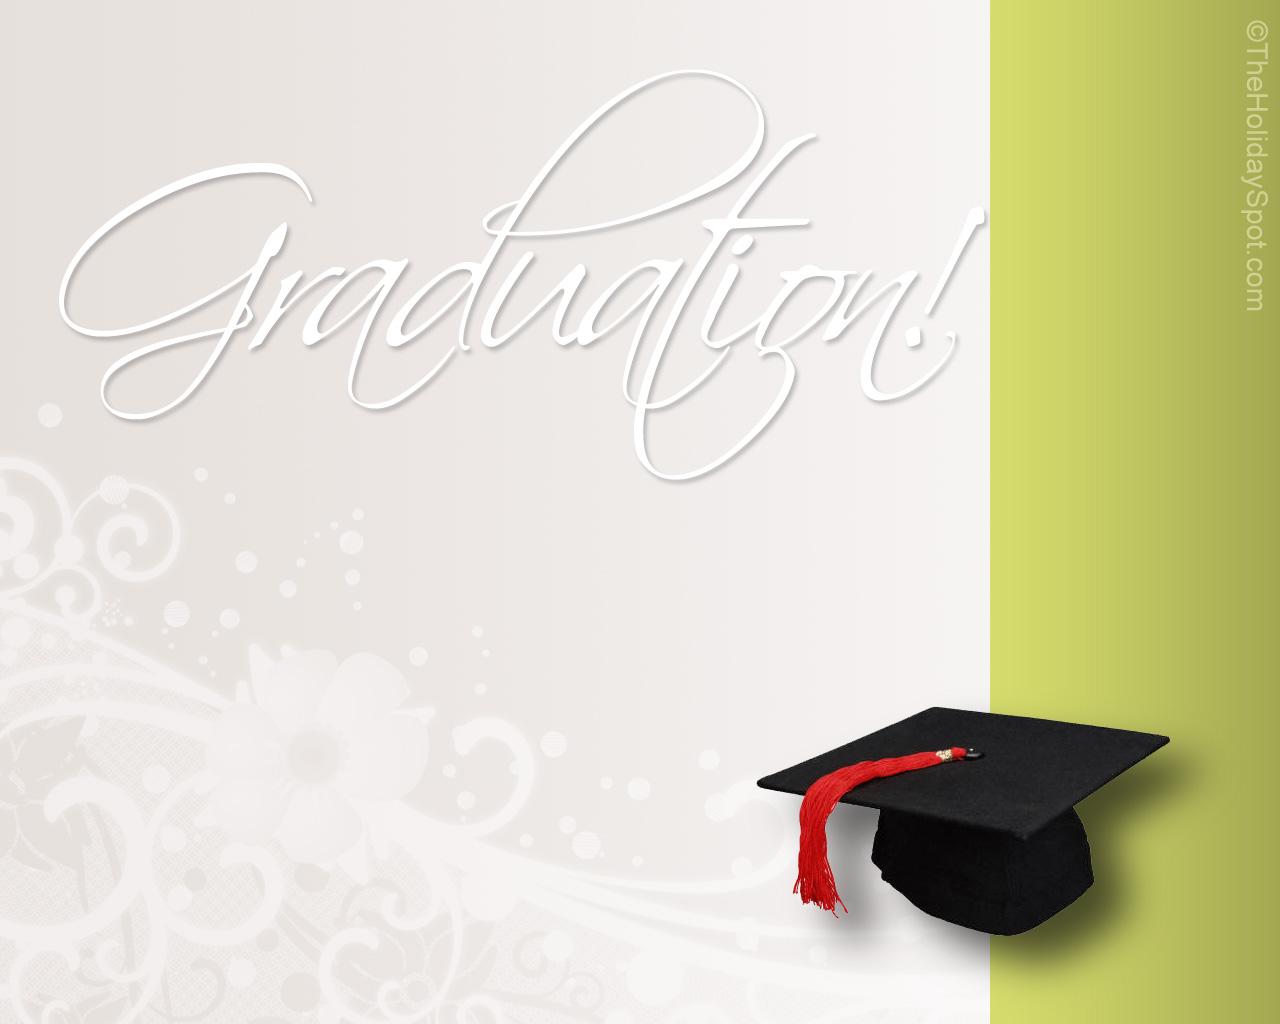 Graduation wallpapers